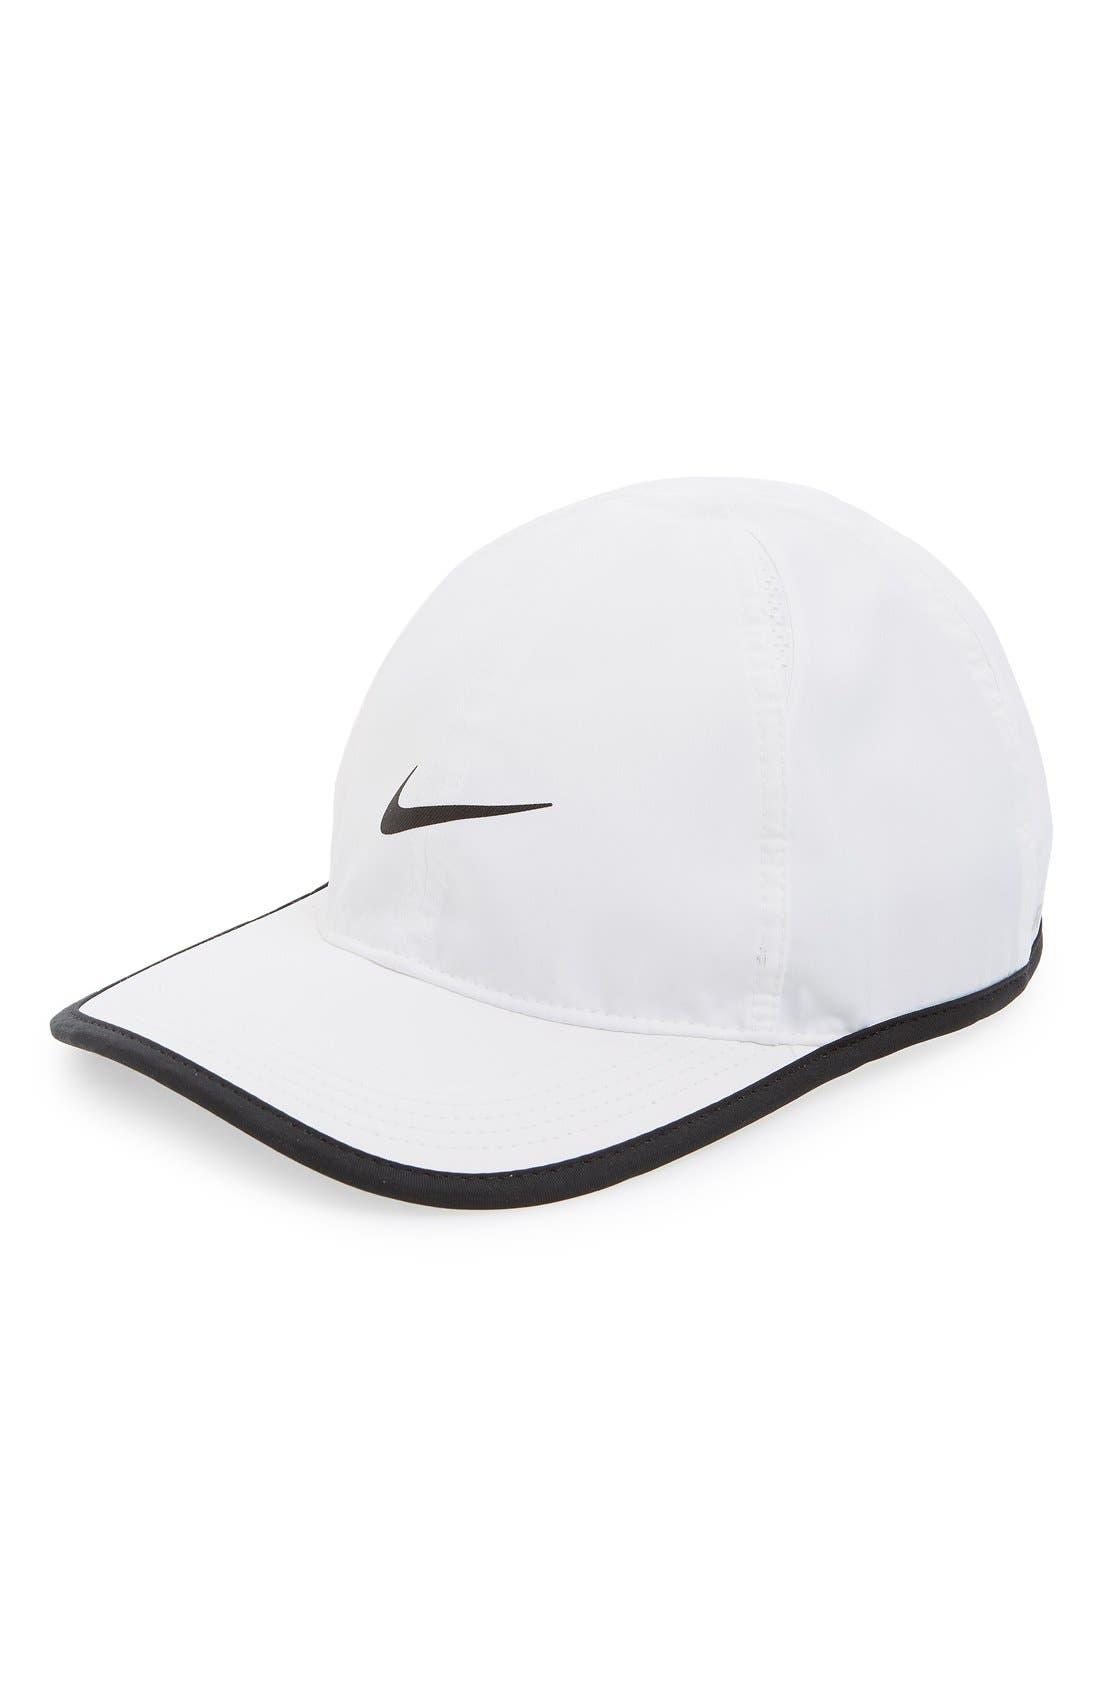 Main Image - Nike 'Featherlight' Baseball Cap